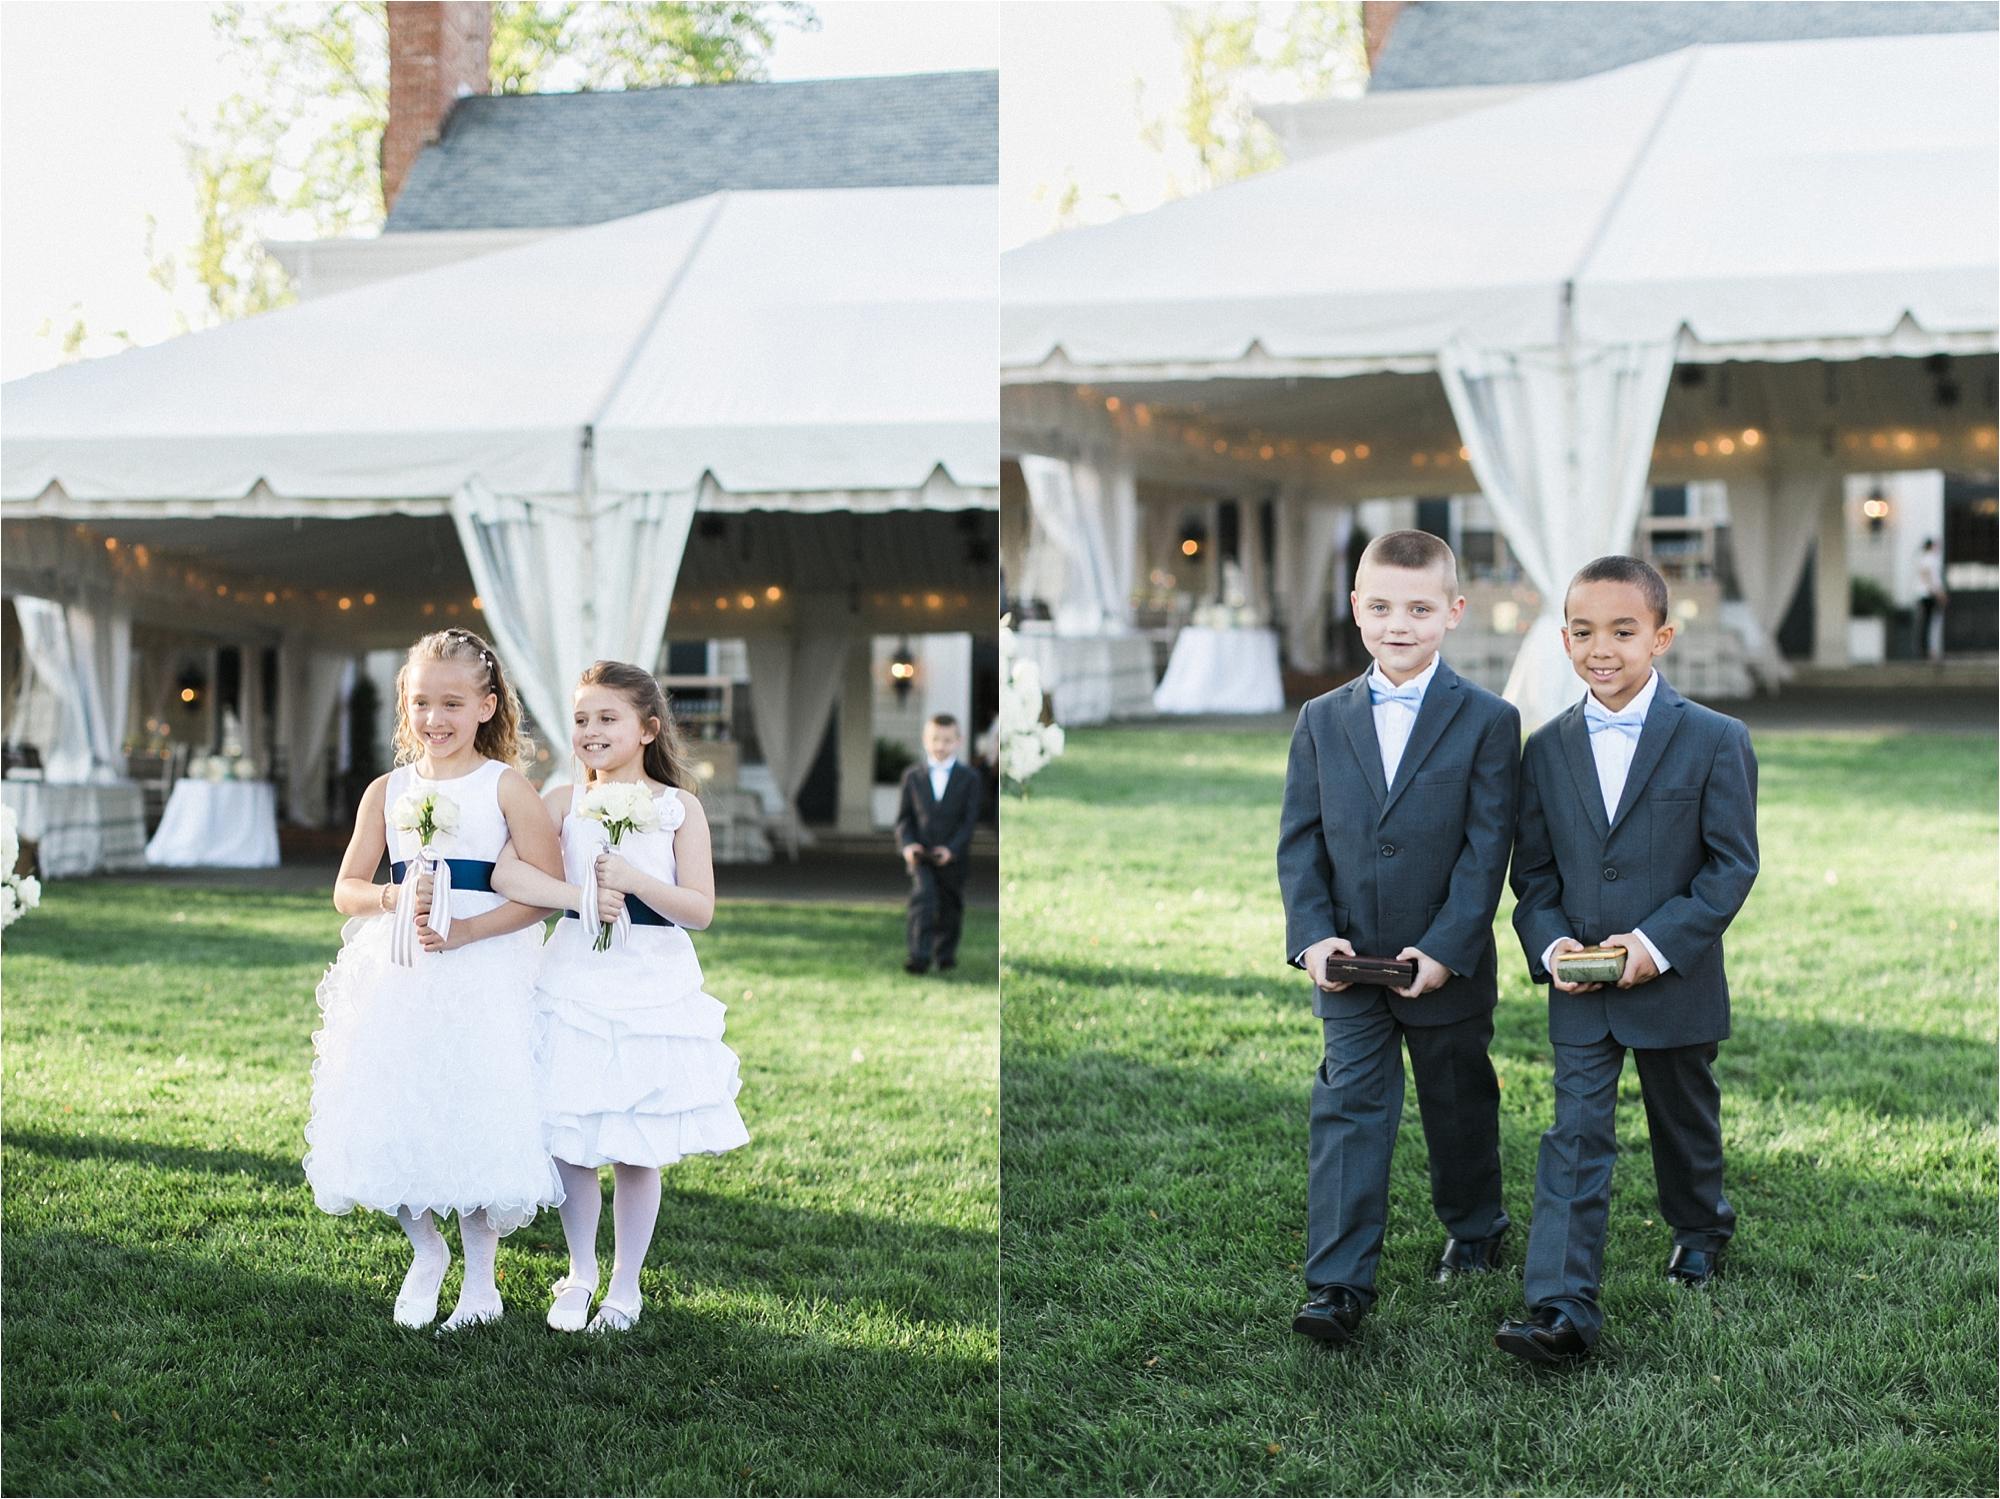 tom-jill-baltimore-maryland-industrial-elegant-wedding-028.JPG